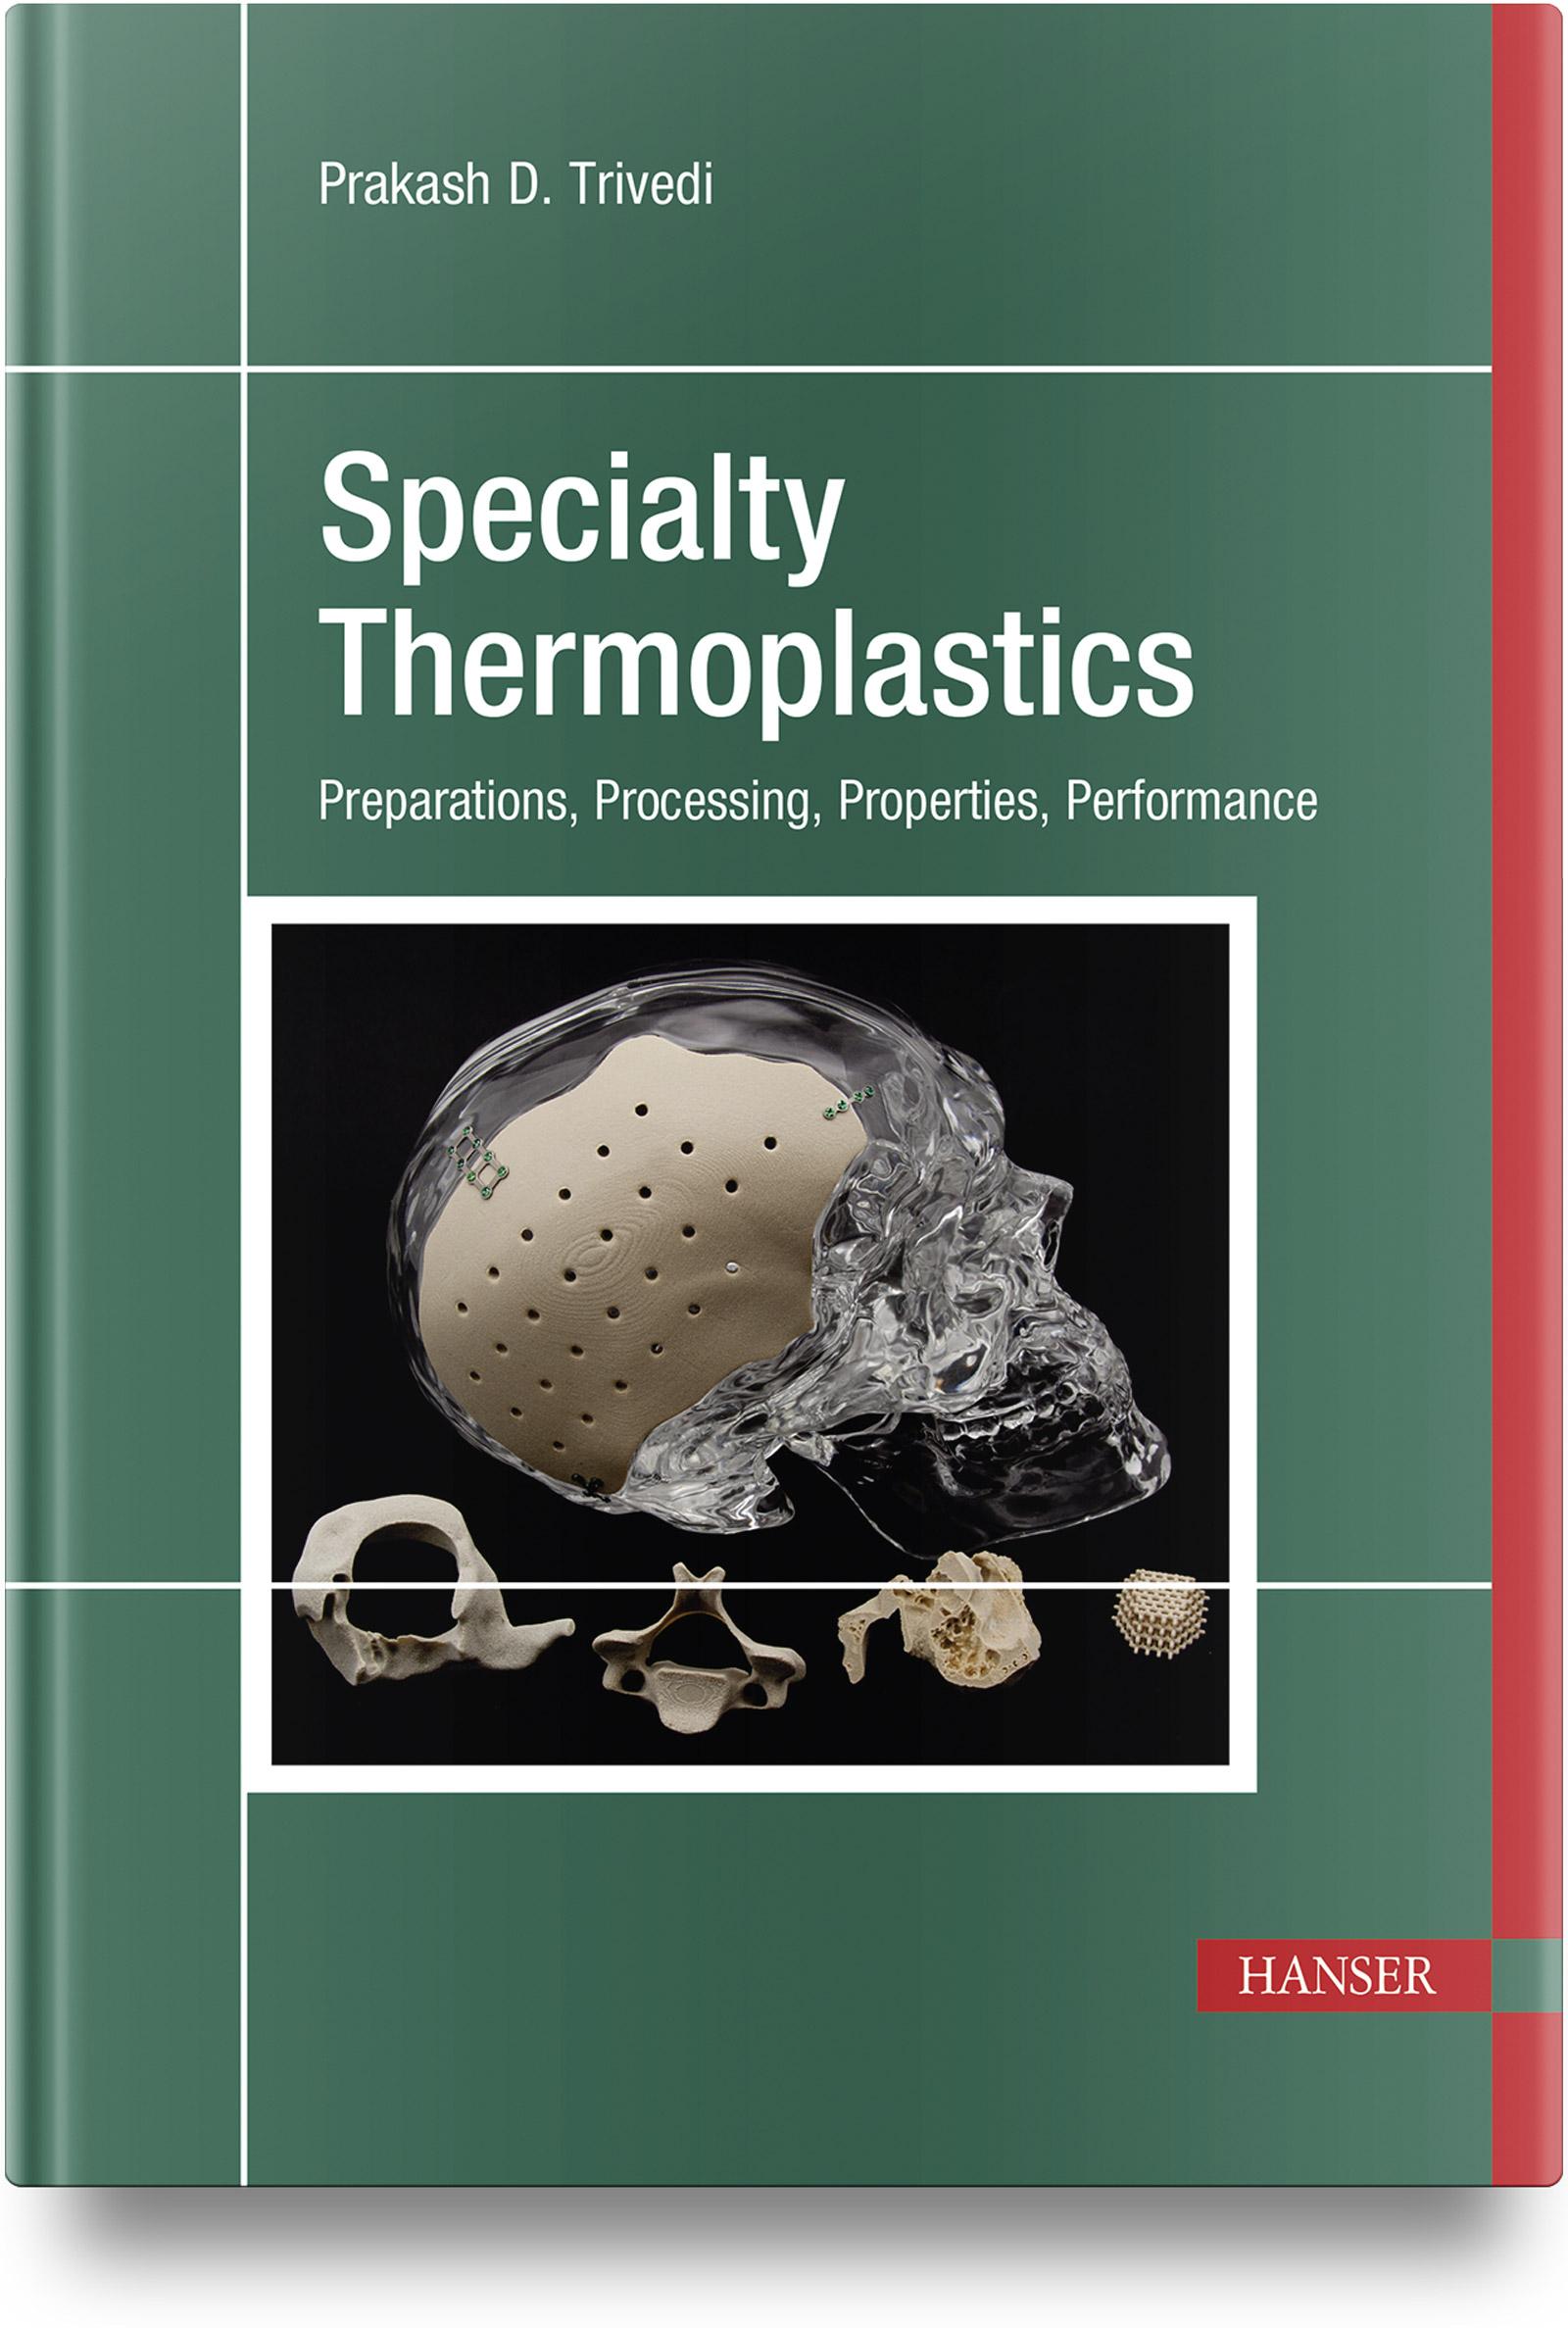 Trivedi, Specialty Thermoplastics, 978-1-56990-700-9